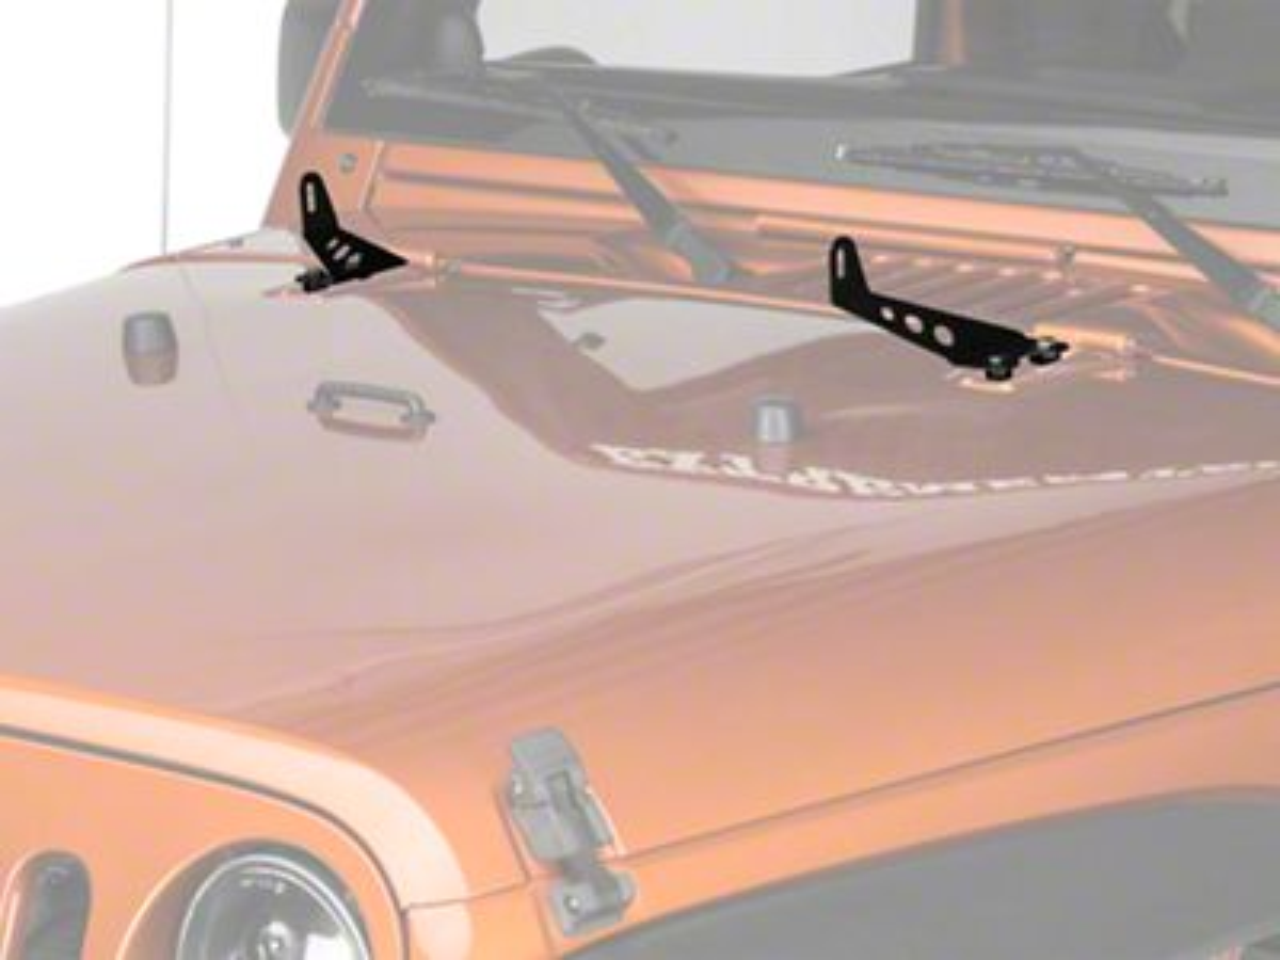 Add Raxiom 24 in. Light Bar Hood Mounting Brackets (07-17 Wrangler JK)